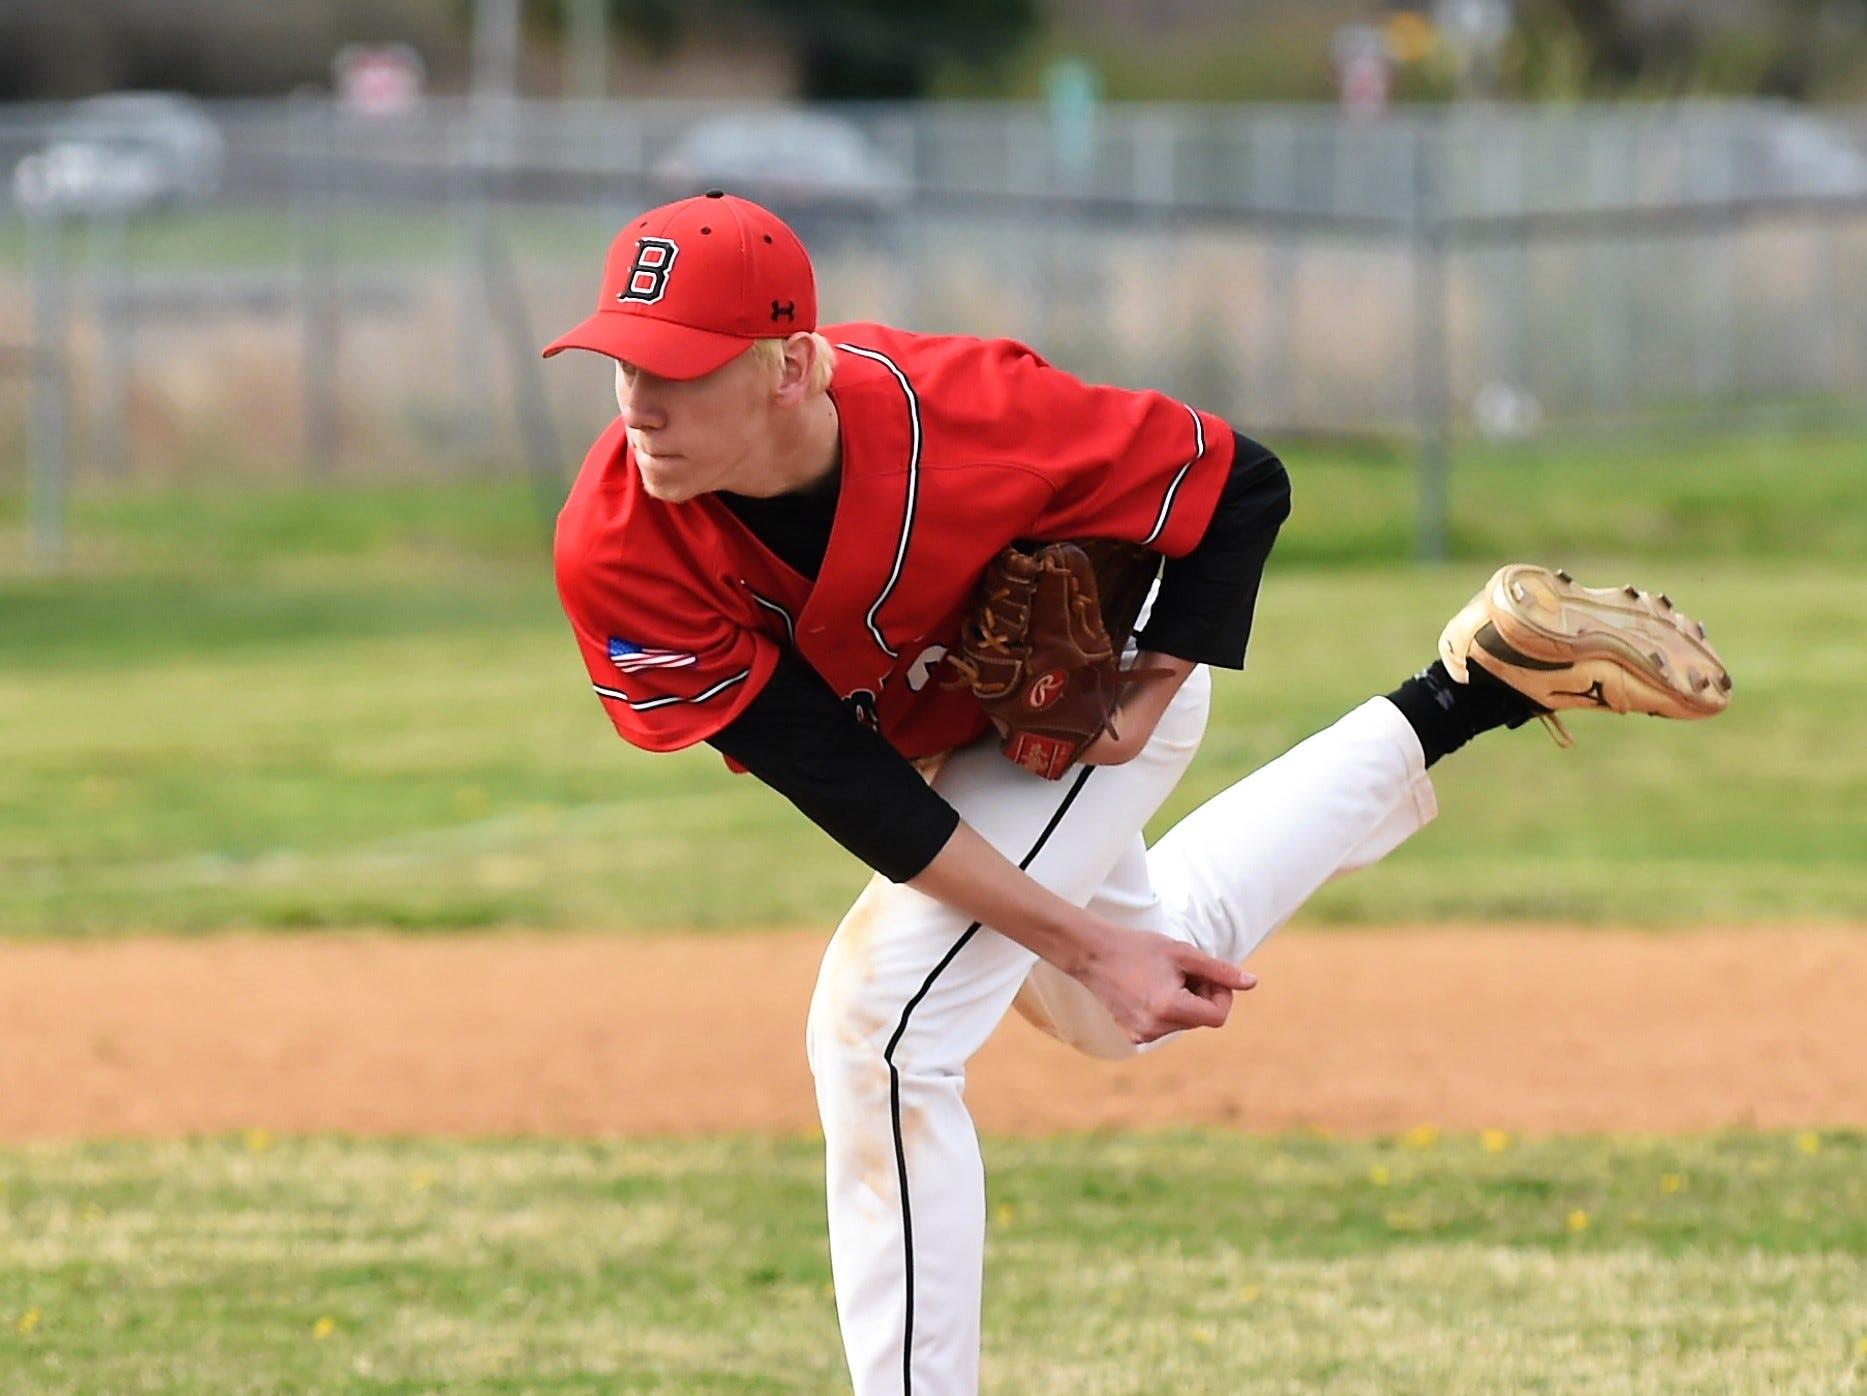 James M. Bennett pitcher Ryan Mitchell throws a pitch against Washington on Thursday, April 11, 2019. JMB won, 13-2.